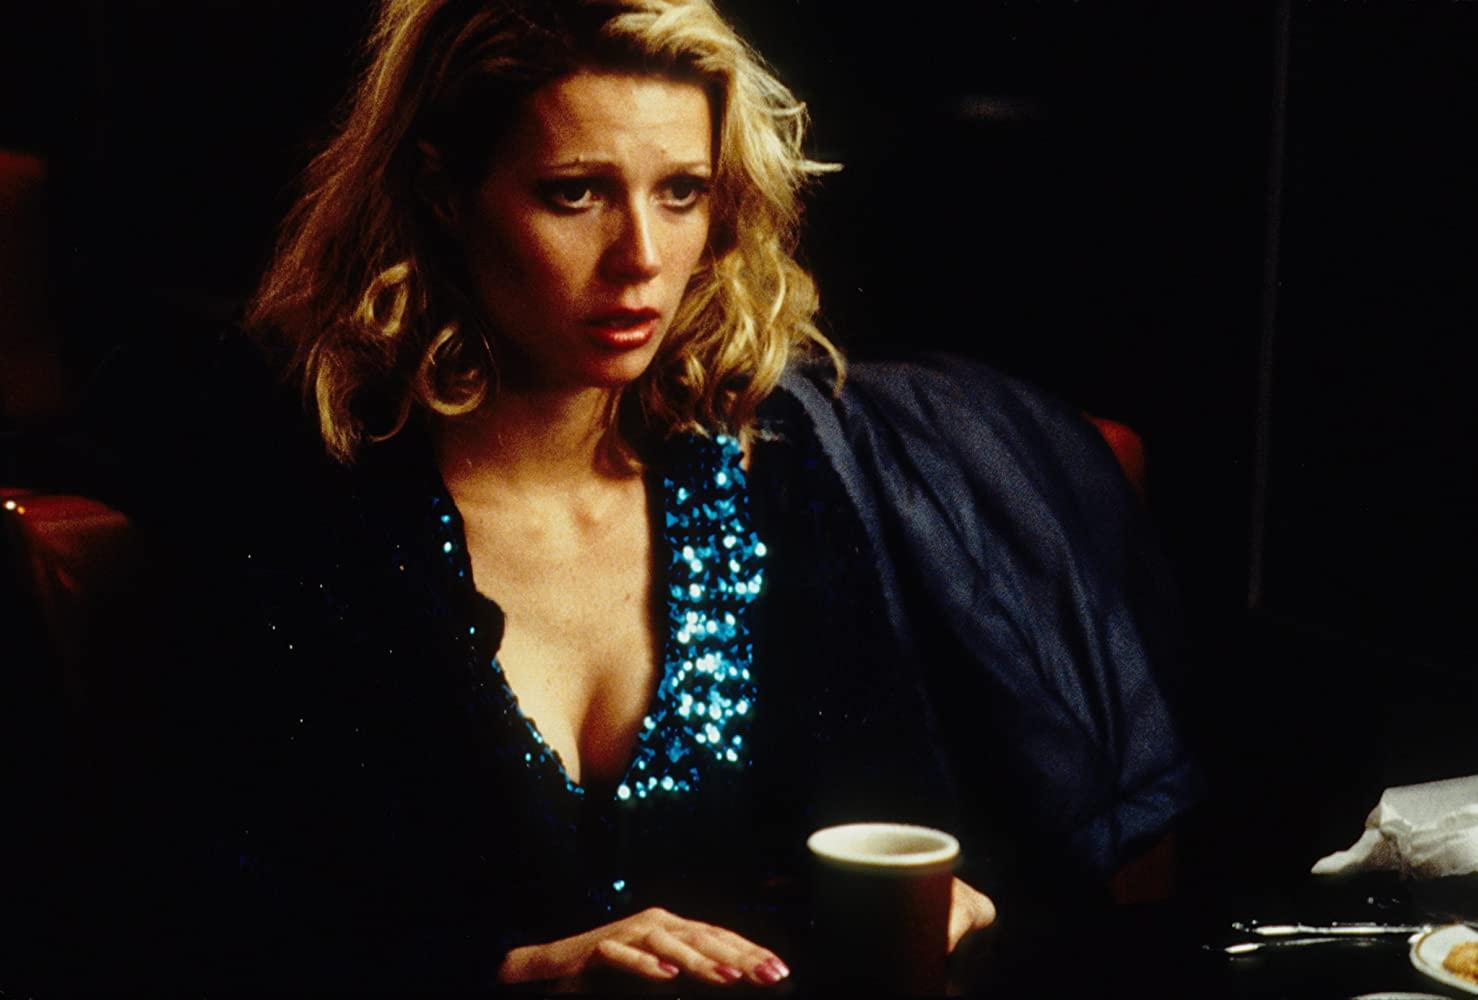 Роковая восьмерка (Sydney) (Hard Eight) 1996